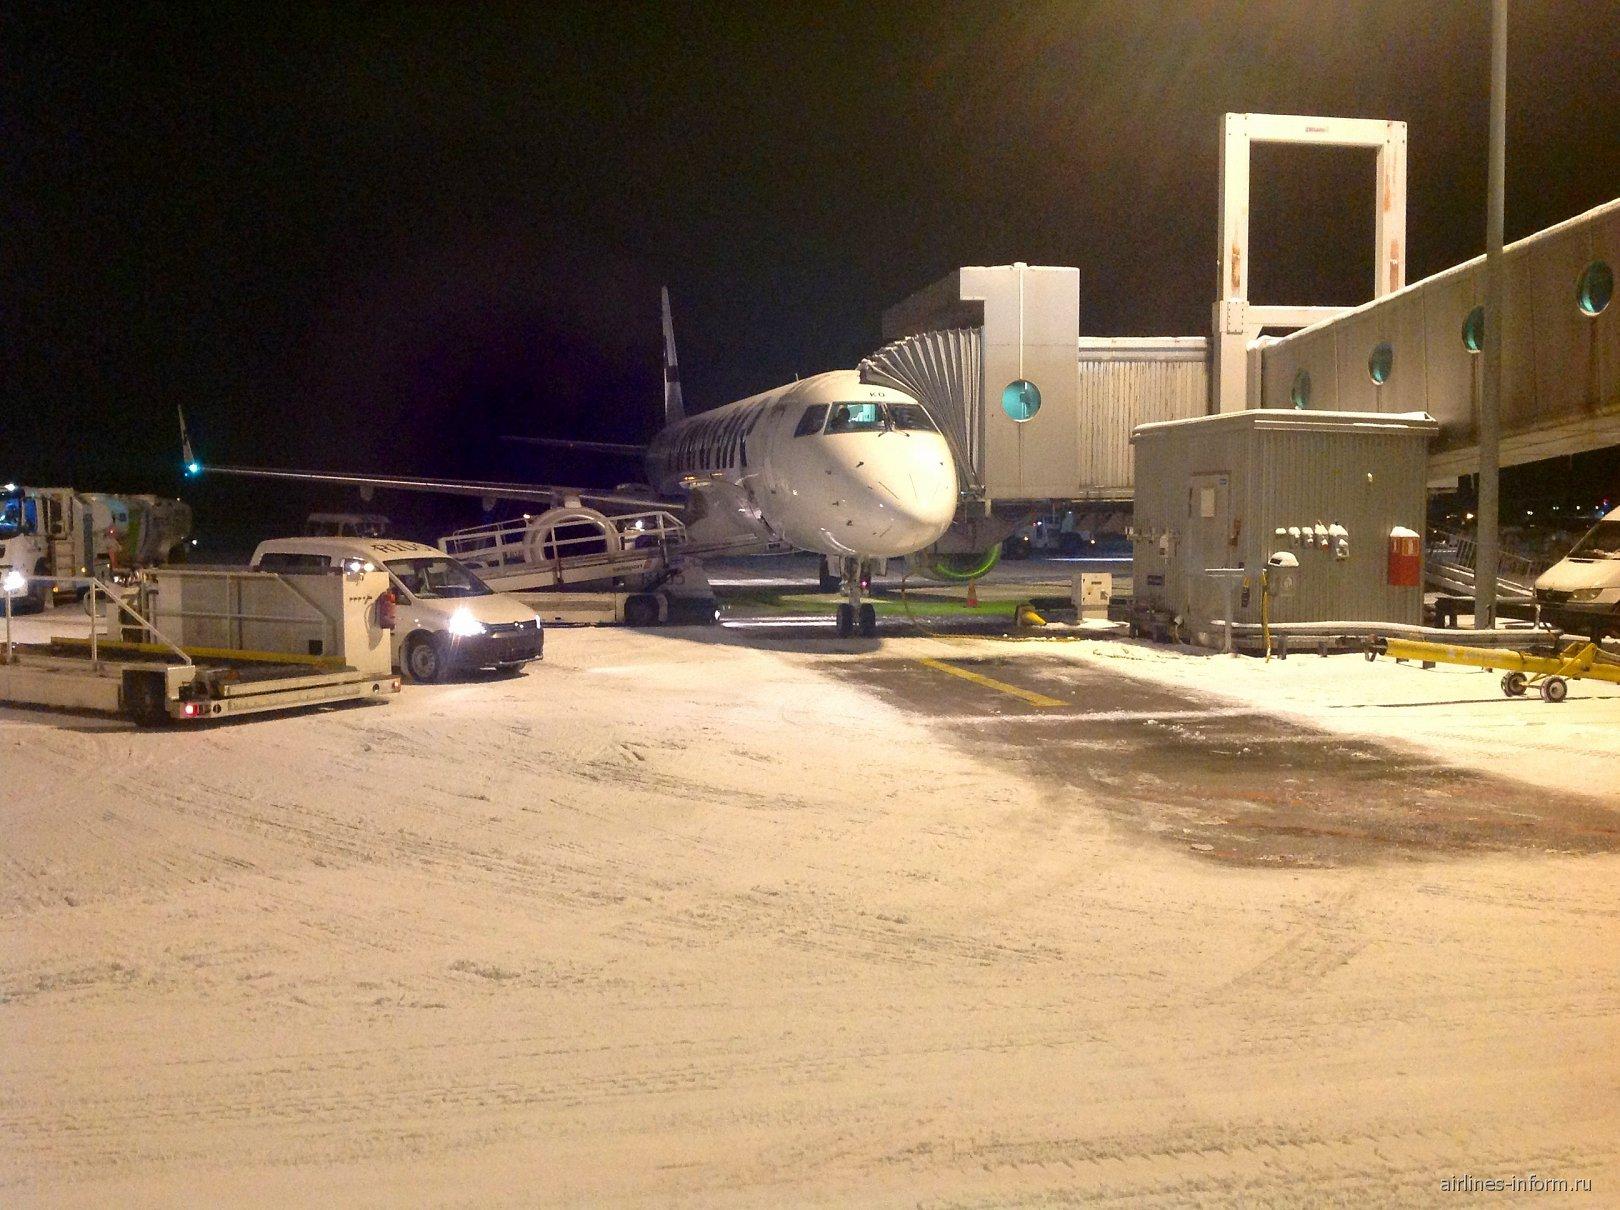 Embraer 170 Finnair в аэропорту Хельсинки Вантаа